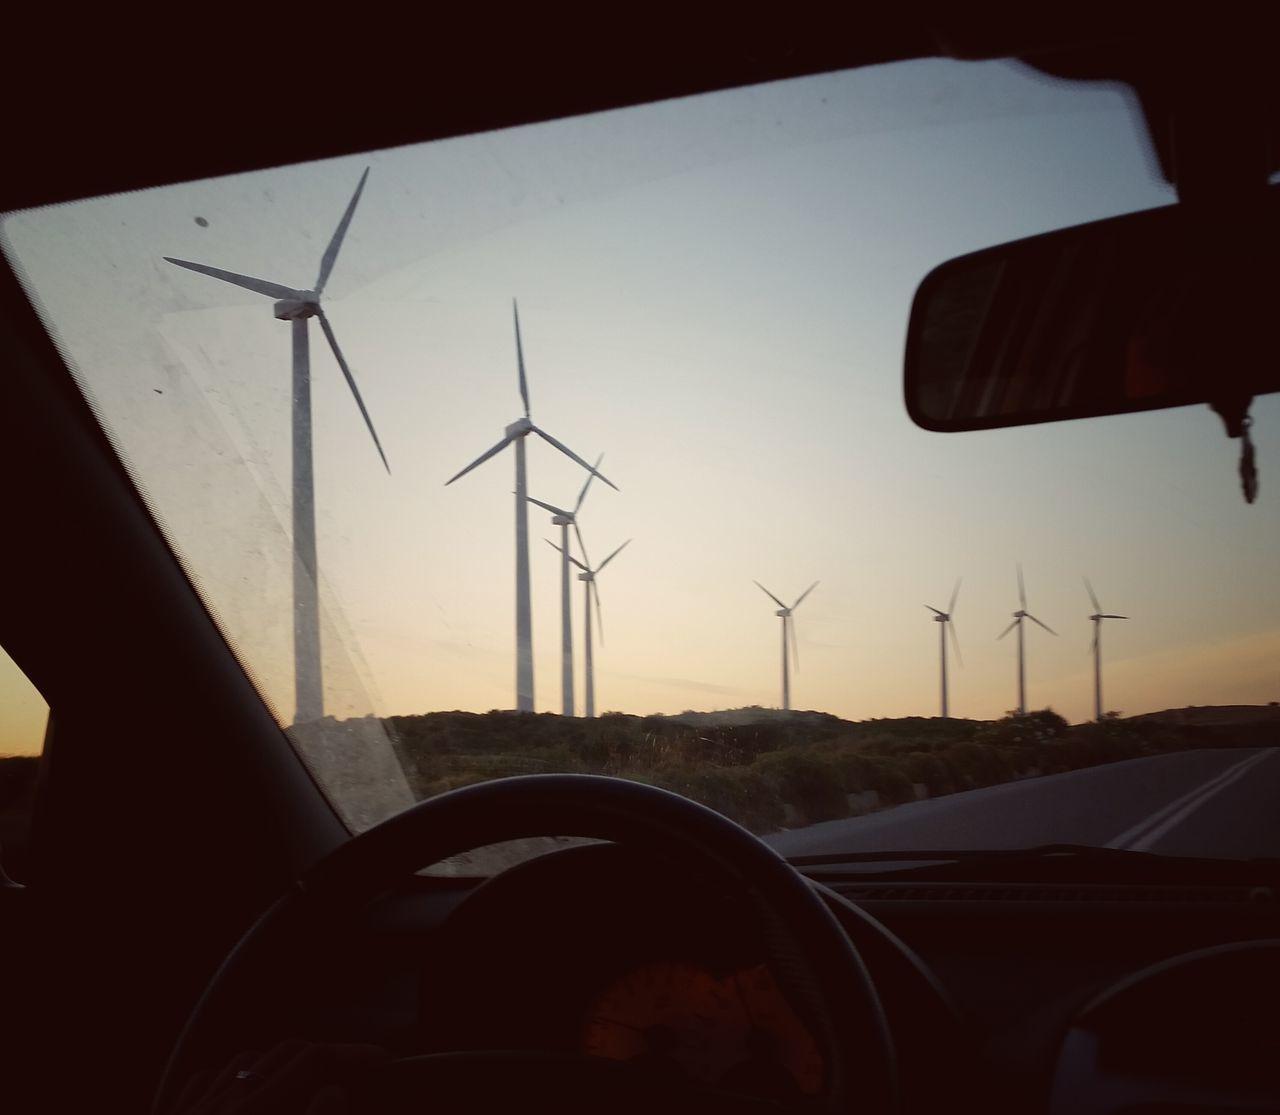 Windmills Seen Through Car Windshield During Sunset